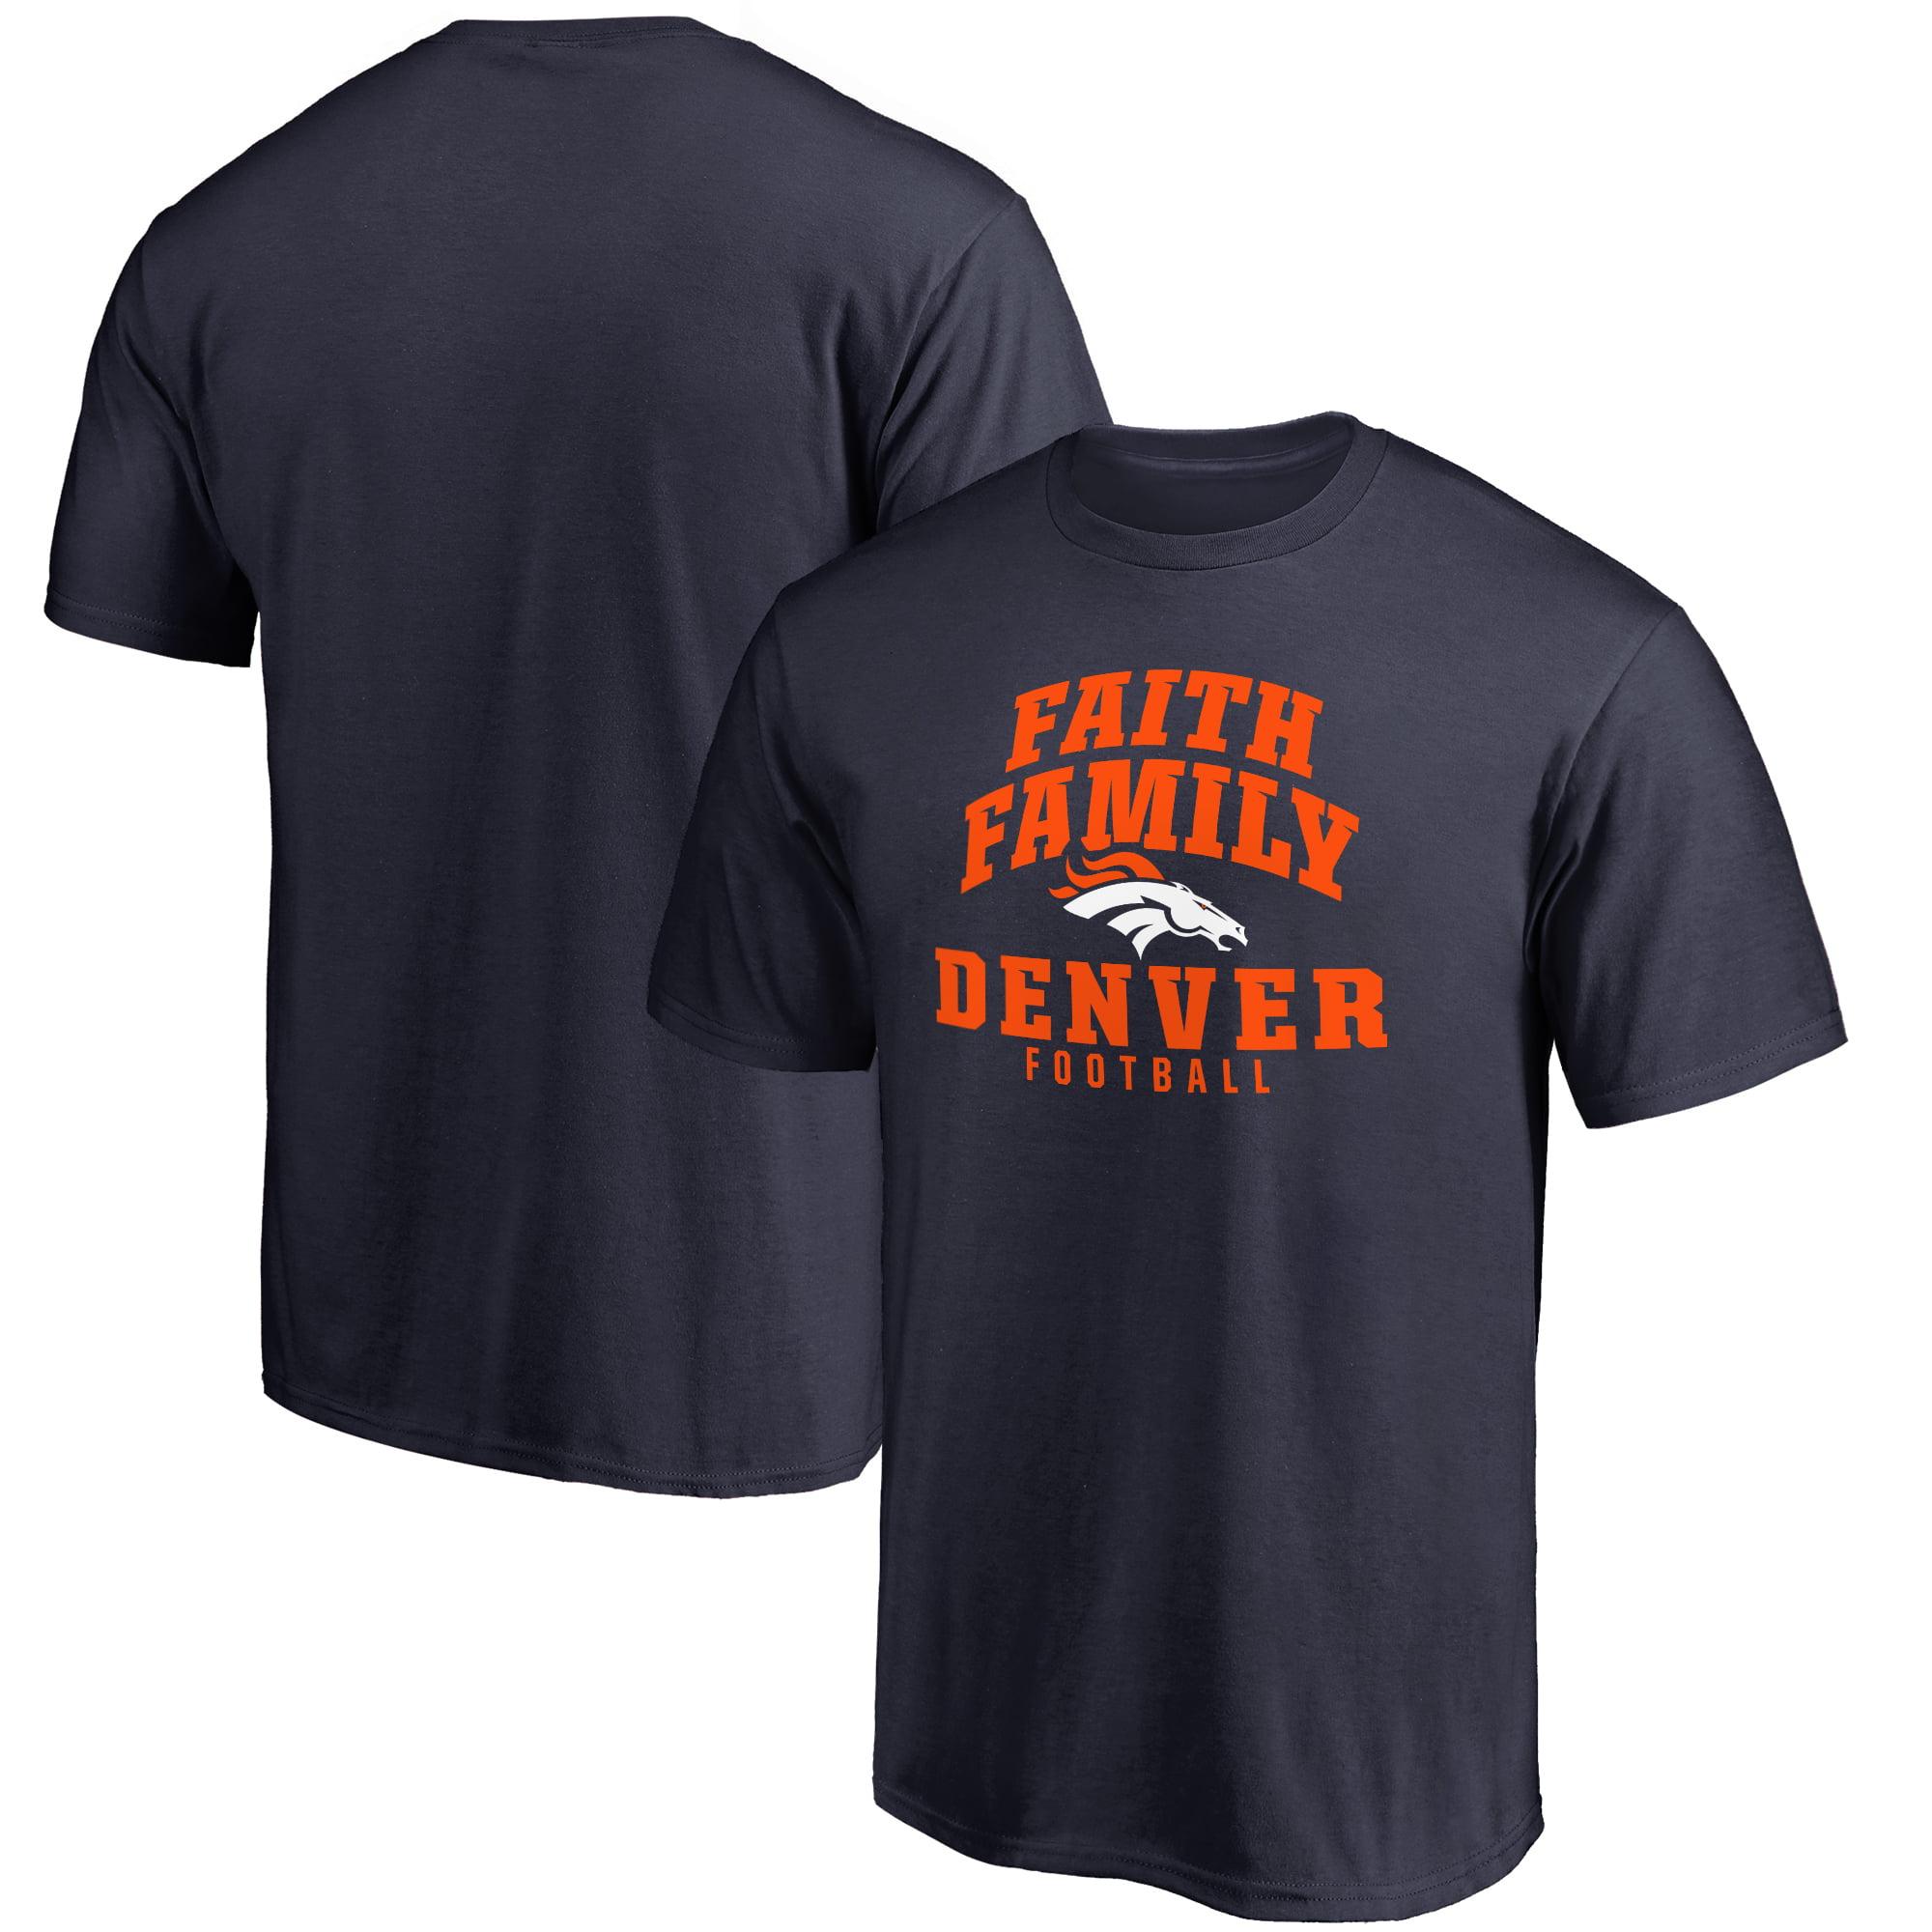 Denver Broncos NFL Pro Line Faith Family T-Shirt - Navy